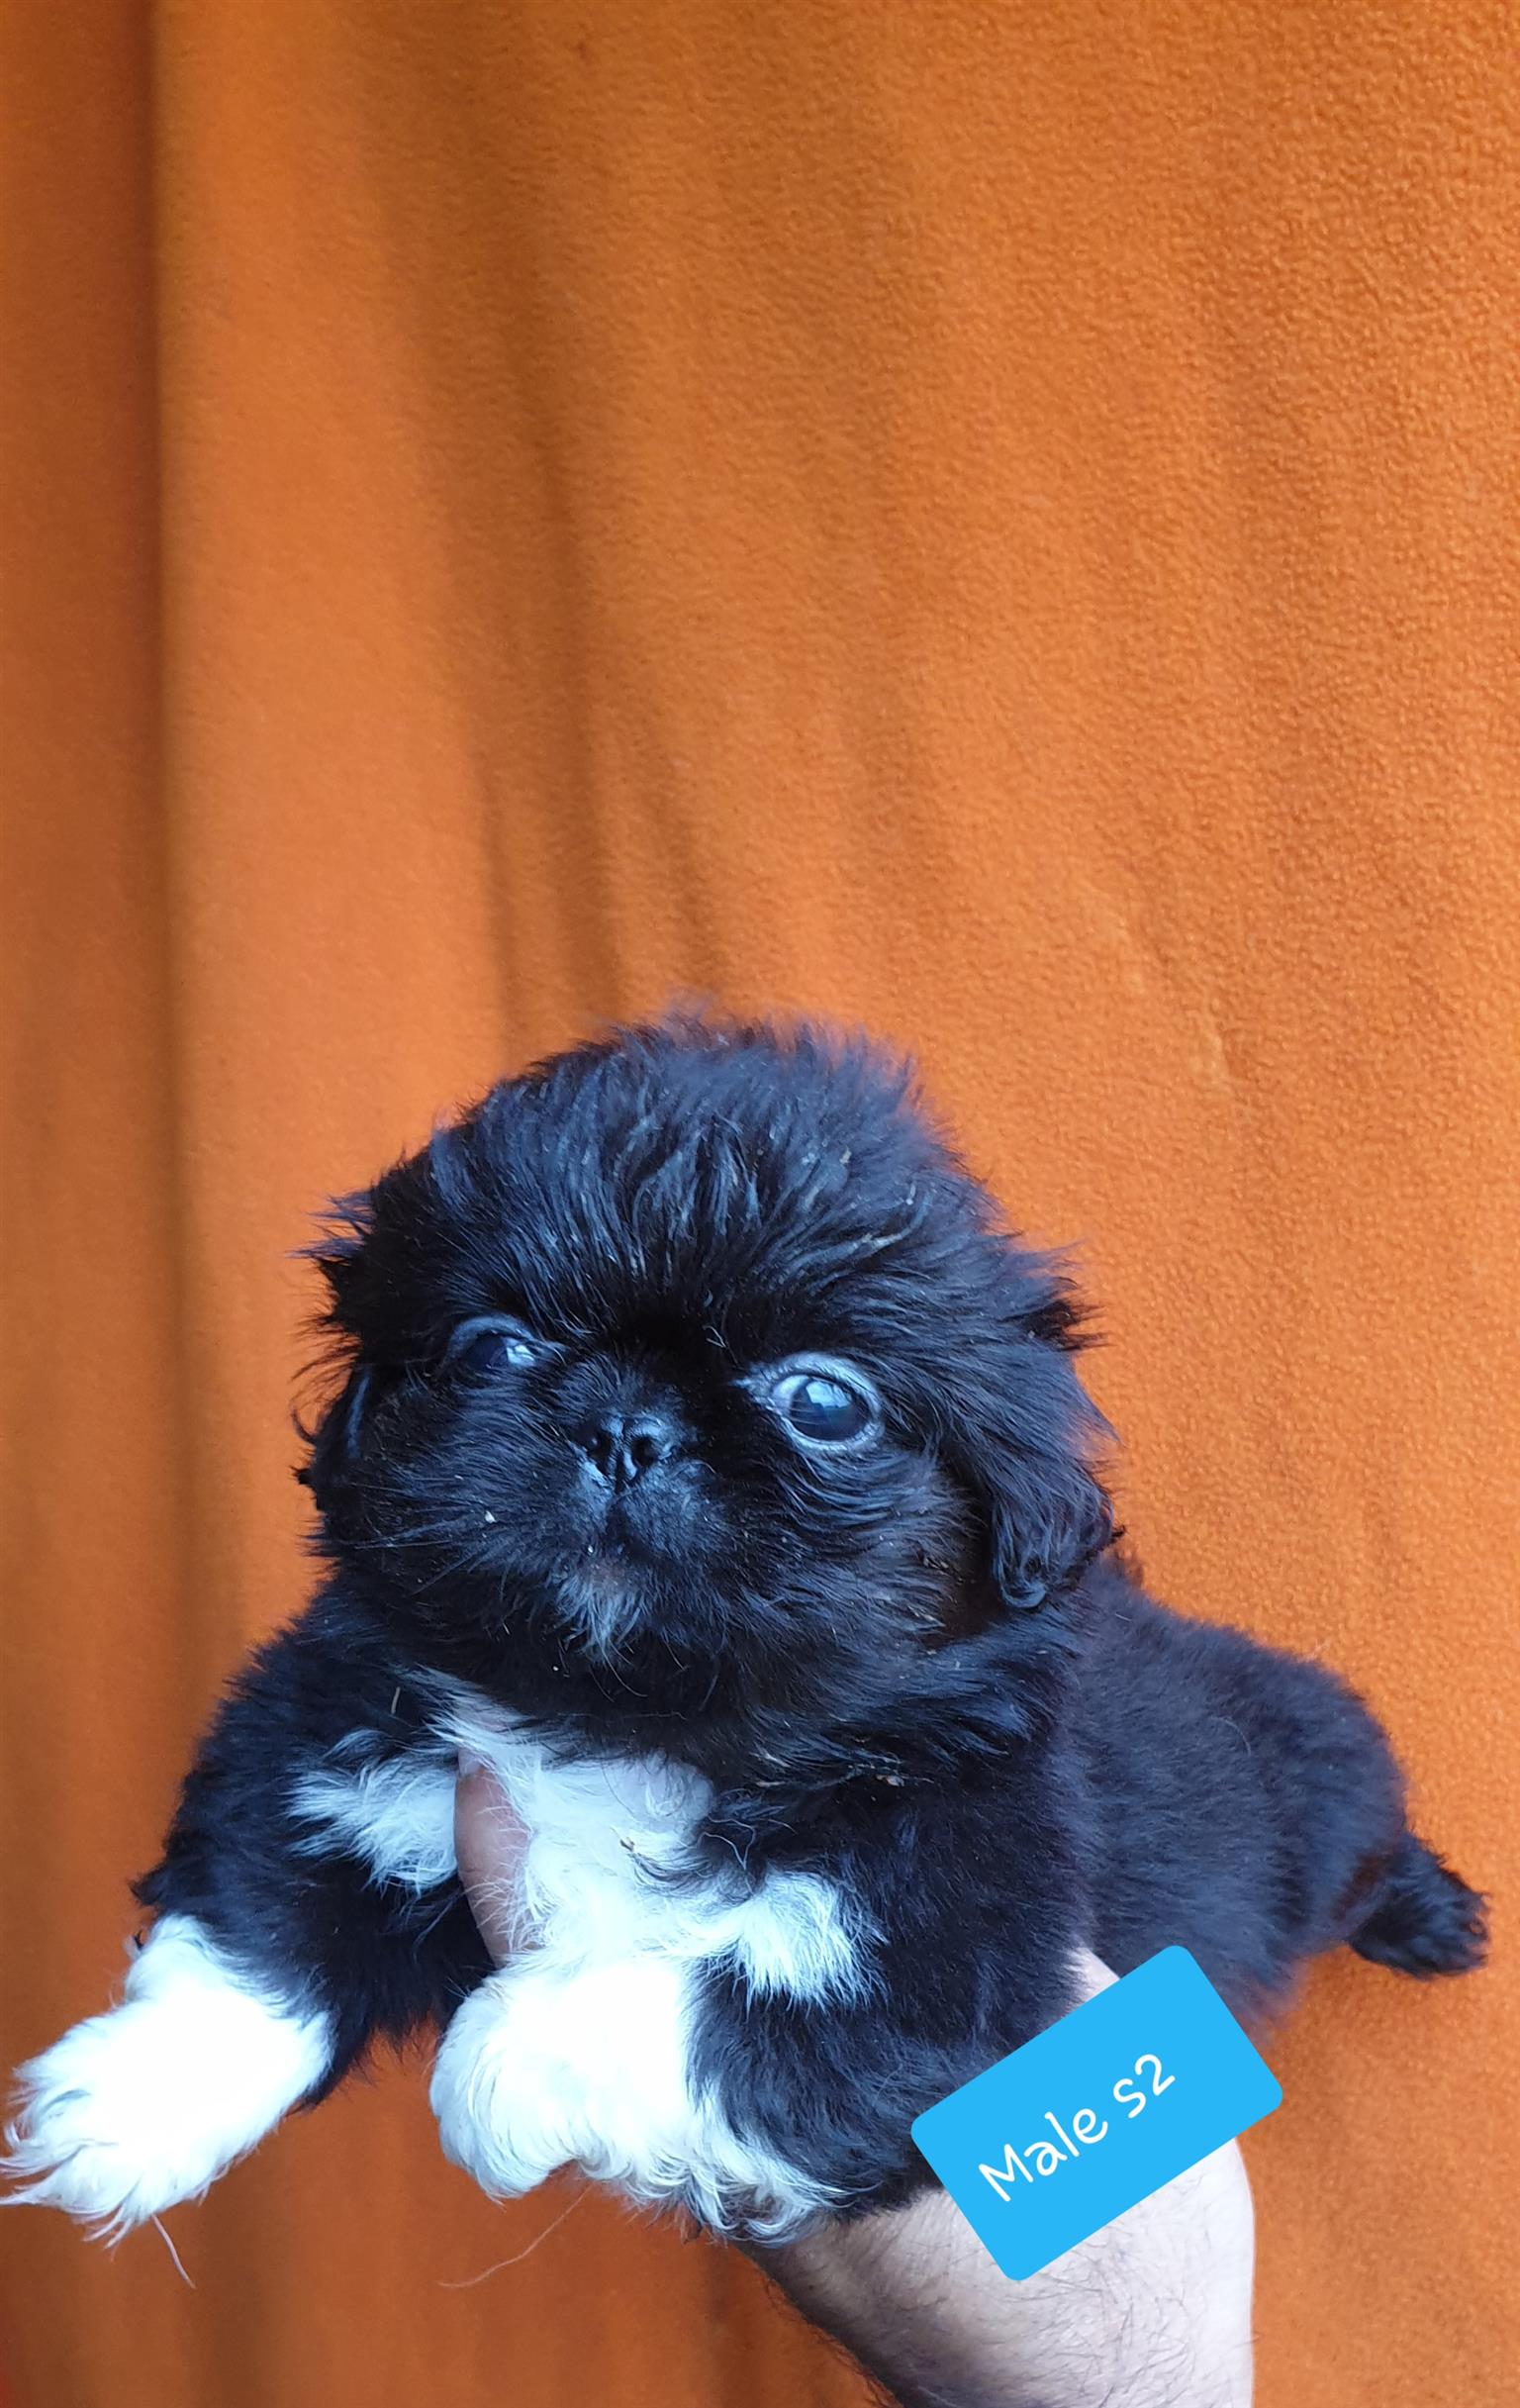 pekingese puppies for sale.Purebred miniature puppies